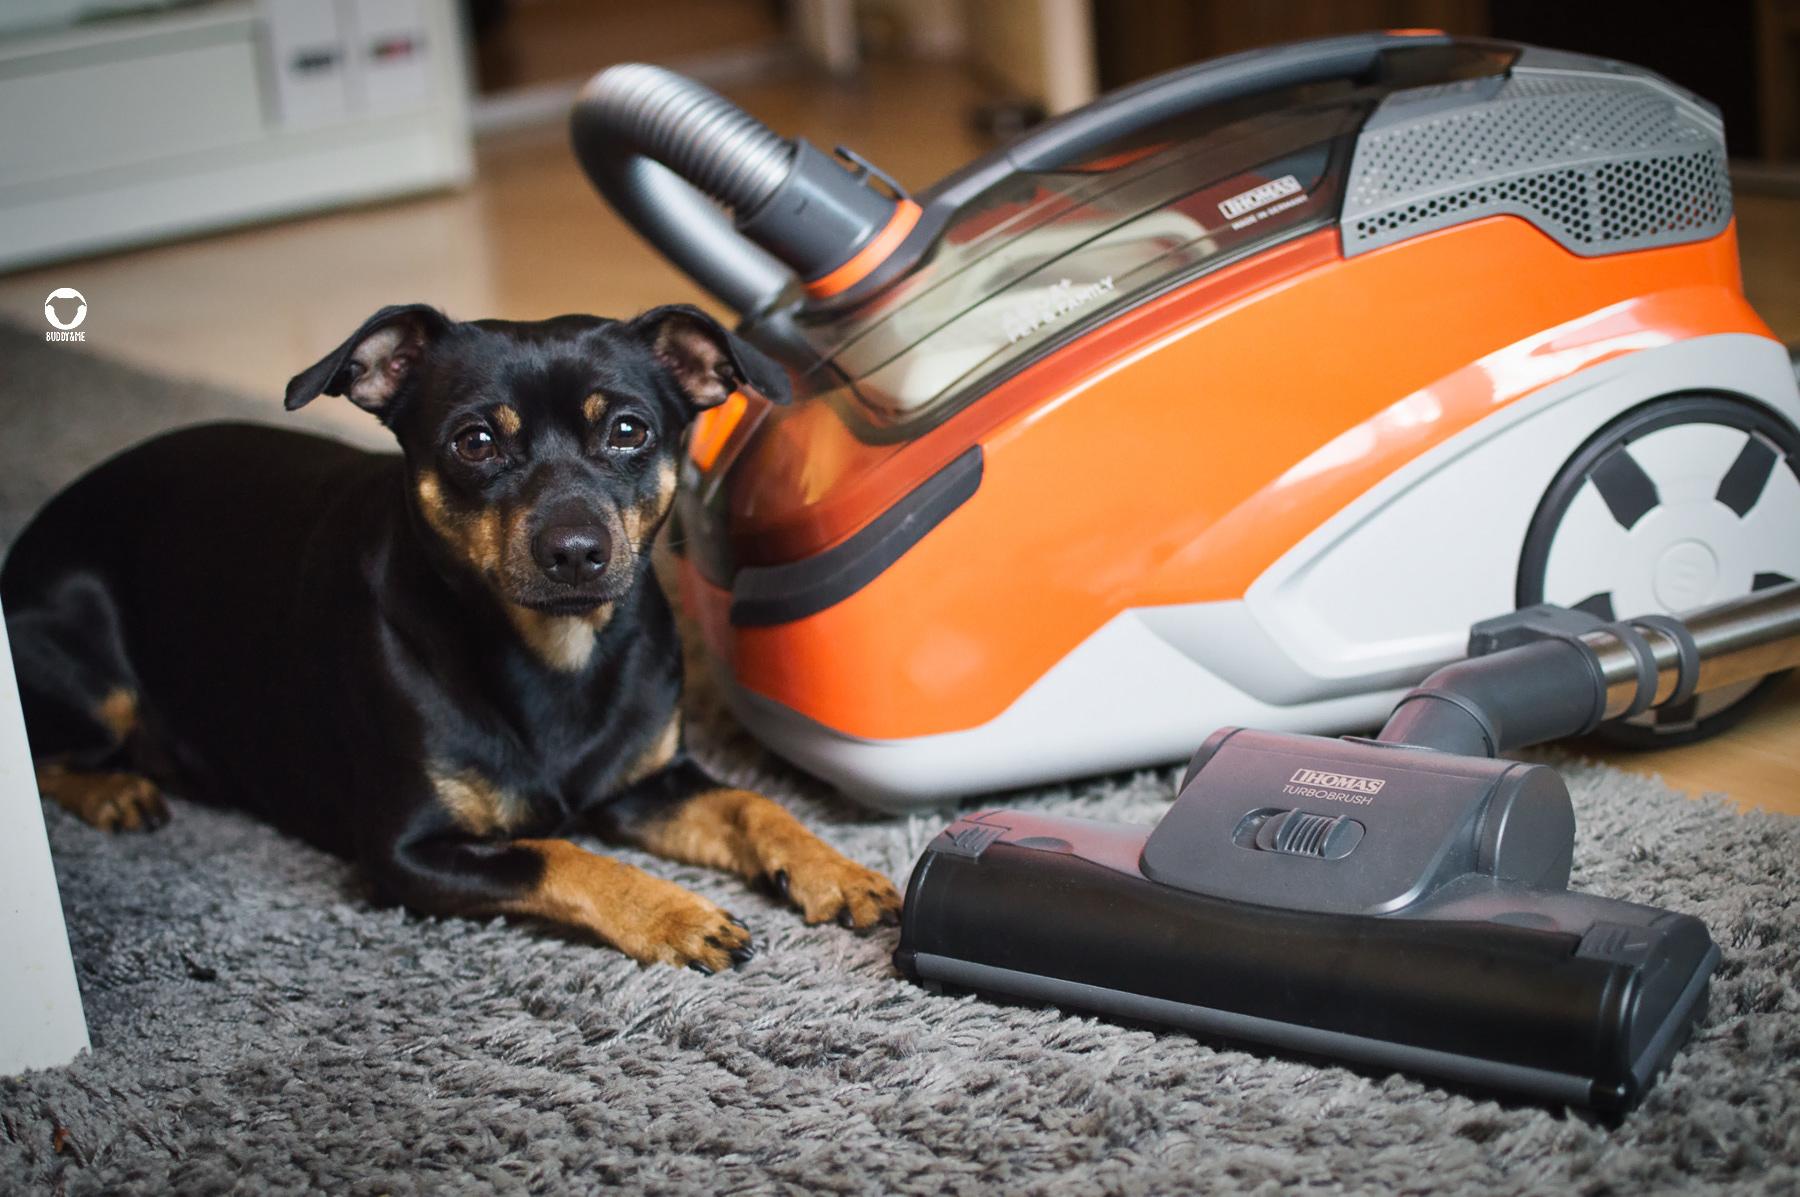 Pinscher Buddy, Buddy and Me, Hundeblog, Dogblog, Produkte, Staubsauger, Thomas Aqua Pet & Family, TierhaarFleckwegmacher, Tierhaare, Hundehaushalt, Sauberkeit, Produkttest, Erfahrungen, Saug-Wisch-Funktion